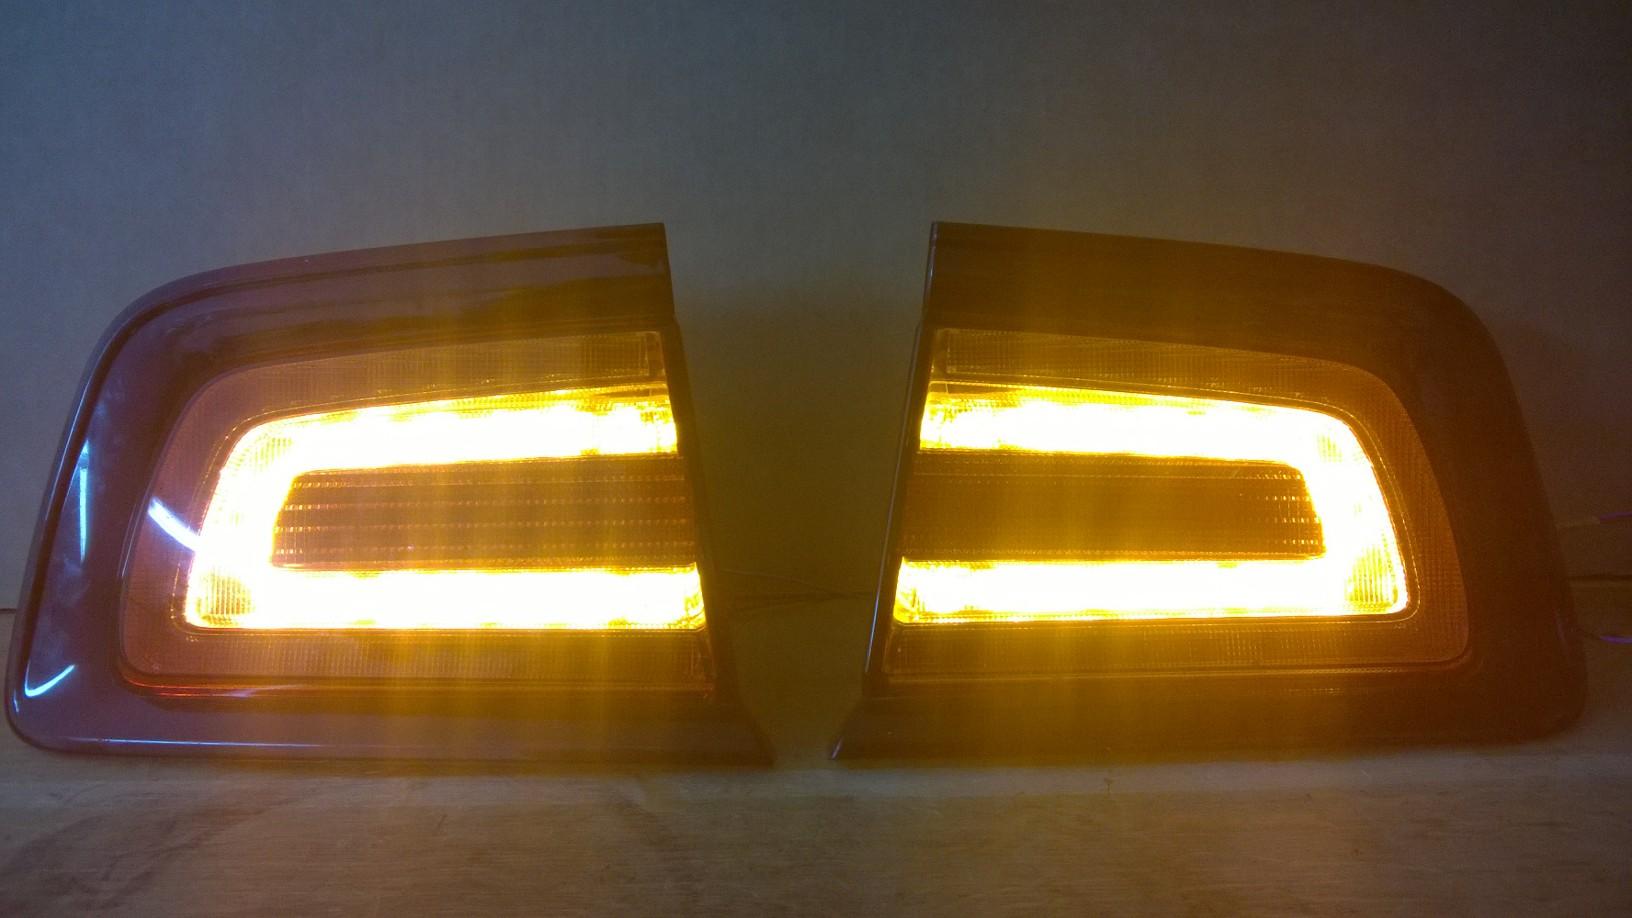 Reparatur von lampen tylnych dodge charger srt8 for Lampen reparatur